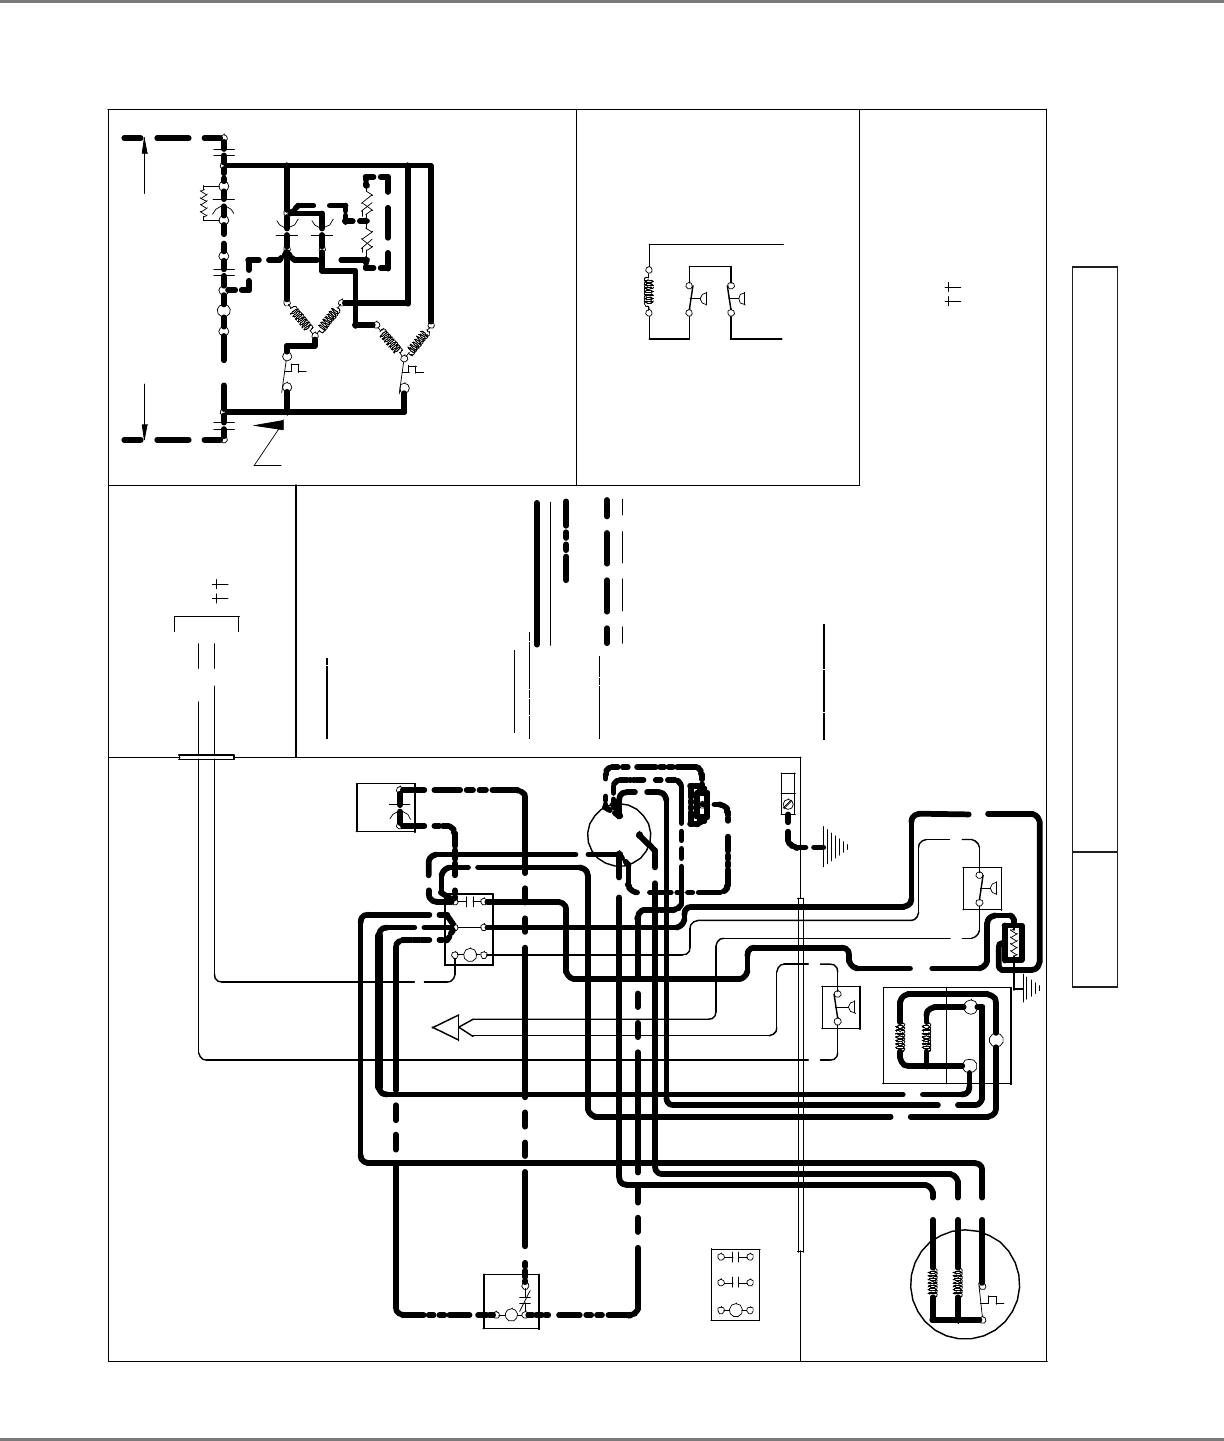 Goodman Mfg Goodman High Efficiency 2 To 5 Ton Split System Air Conditioner Ss Ssx16 Label Wiring Diagram